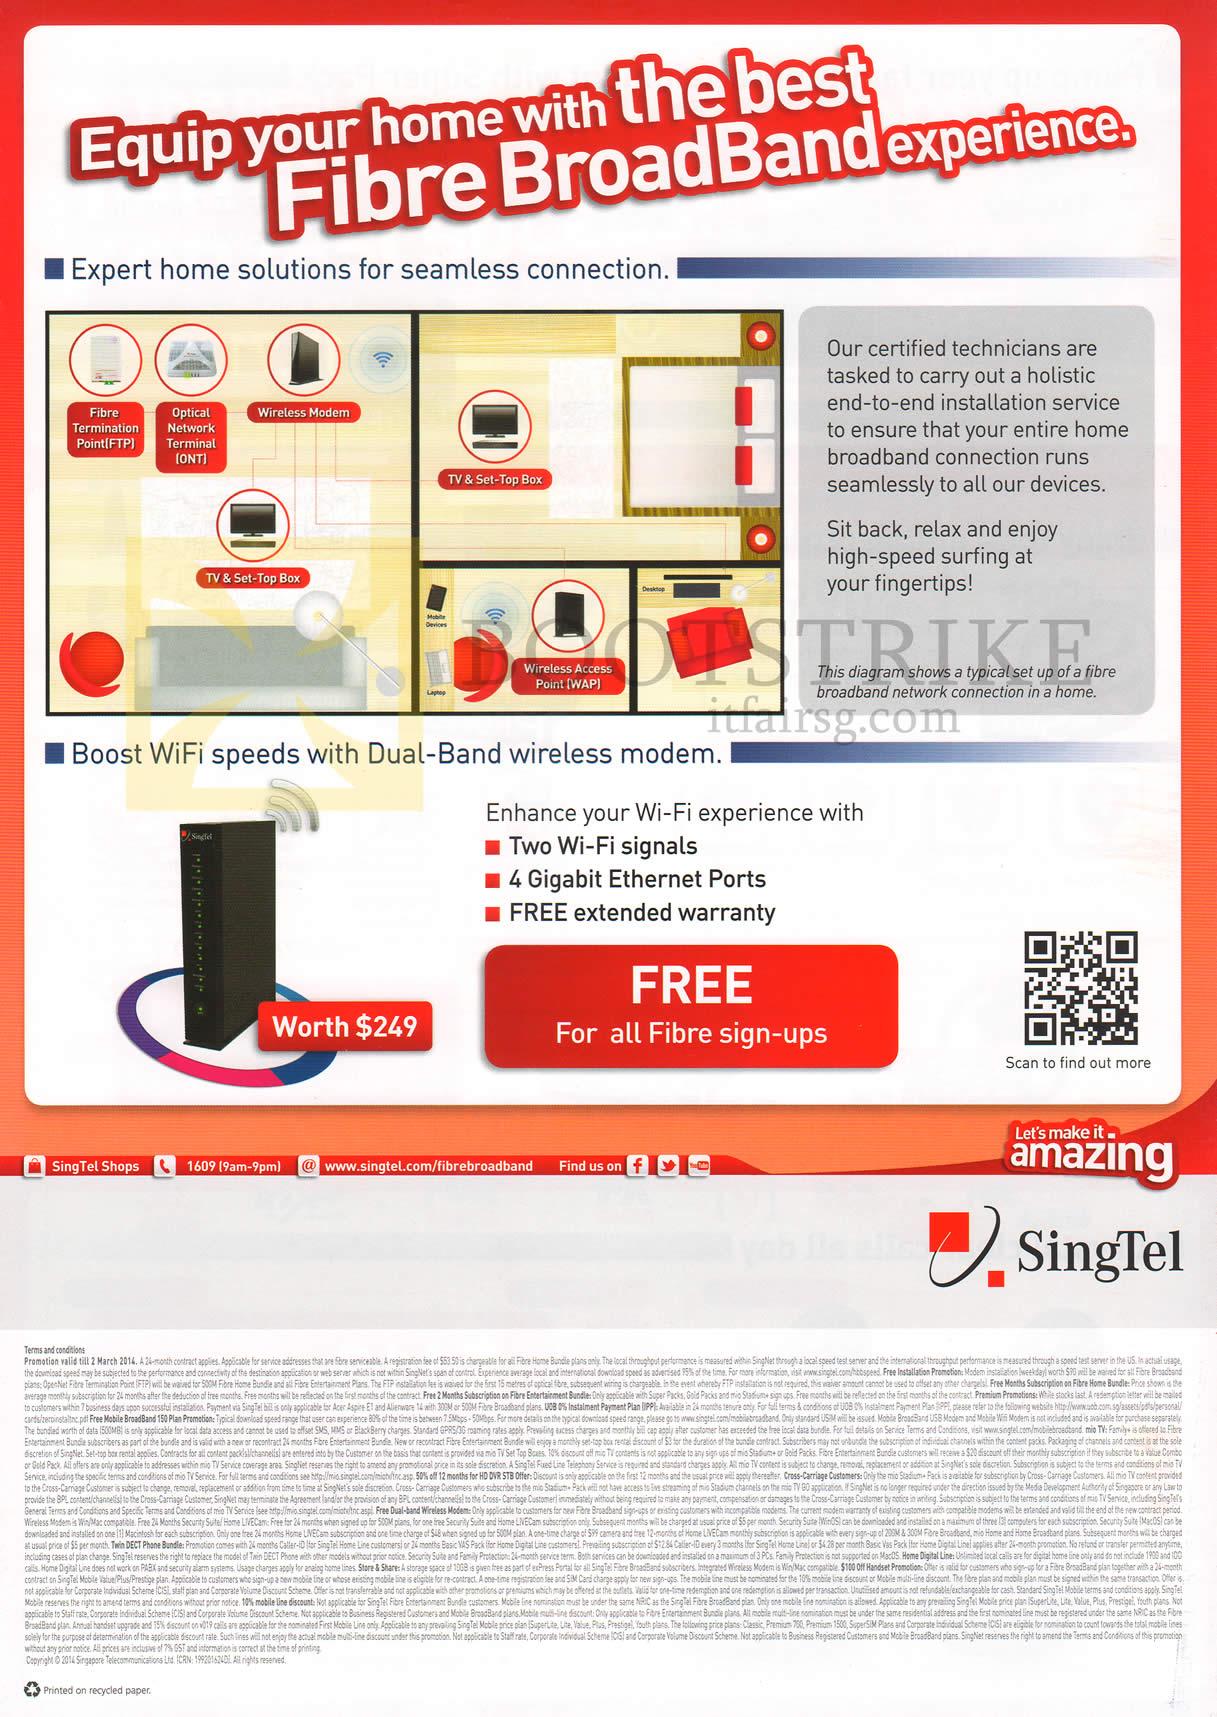 Singtel Fibre Broadband Home Bundles Expert Home Solutions